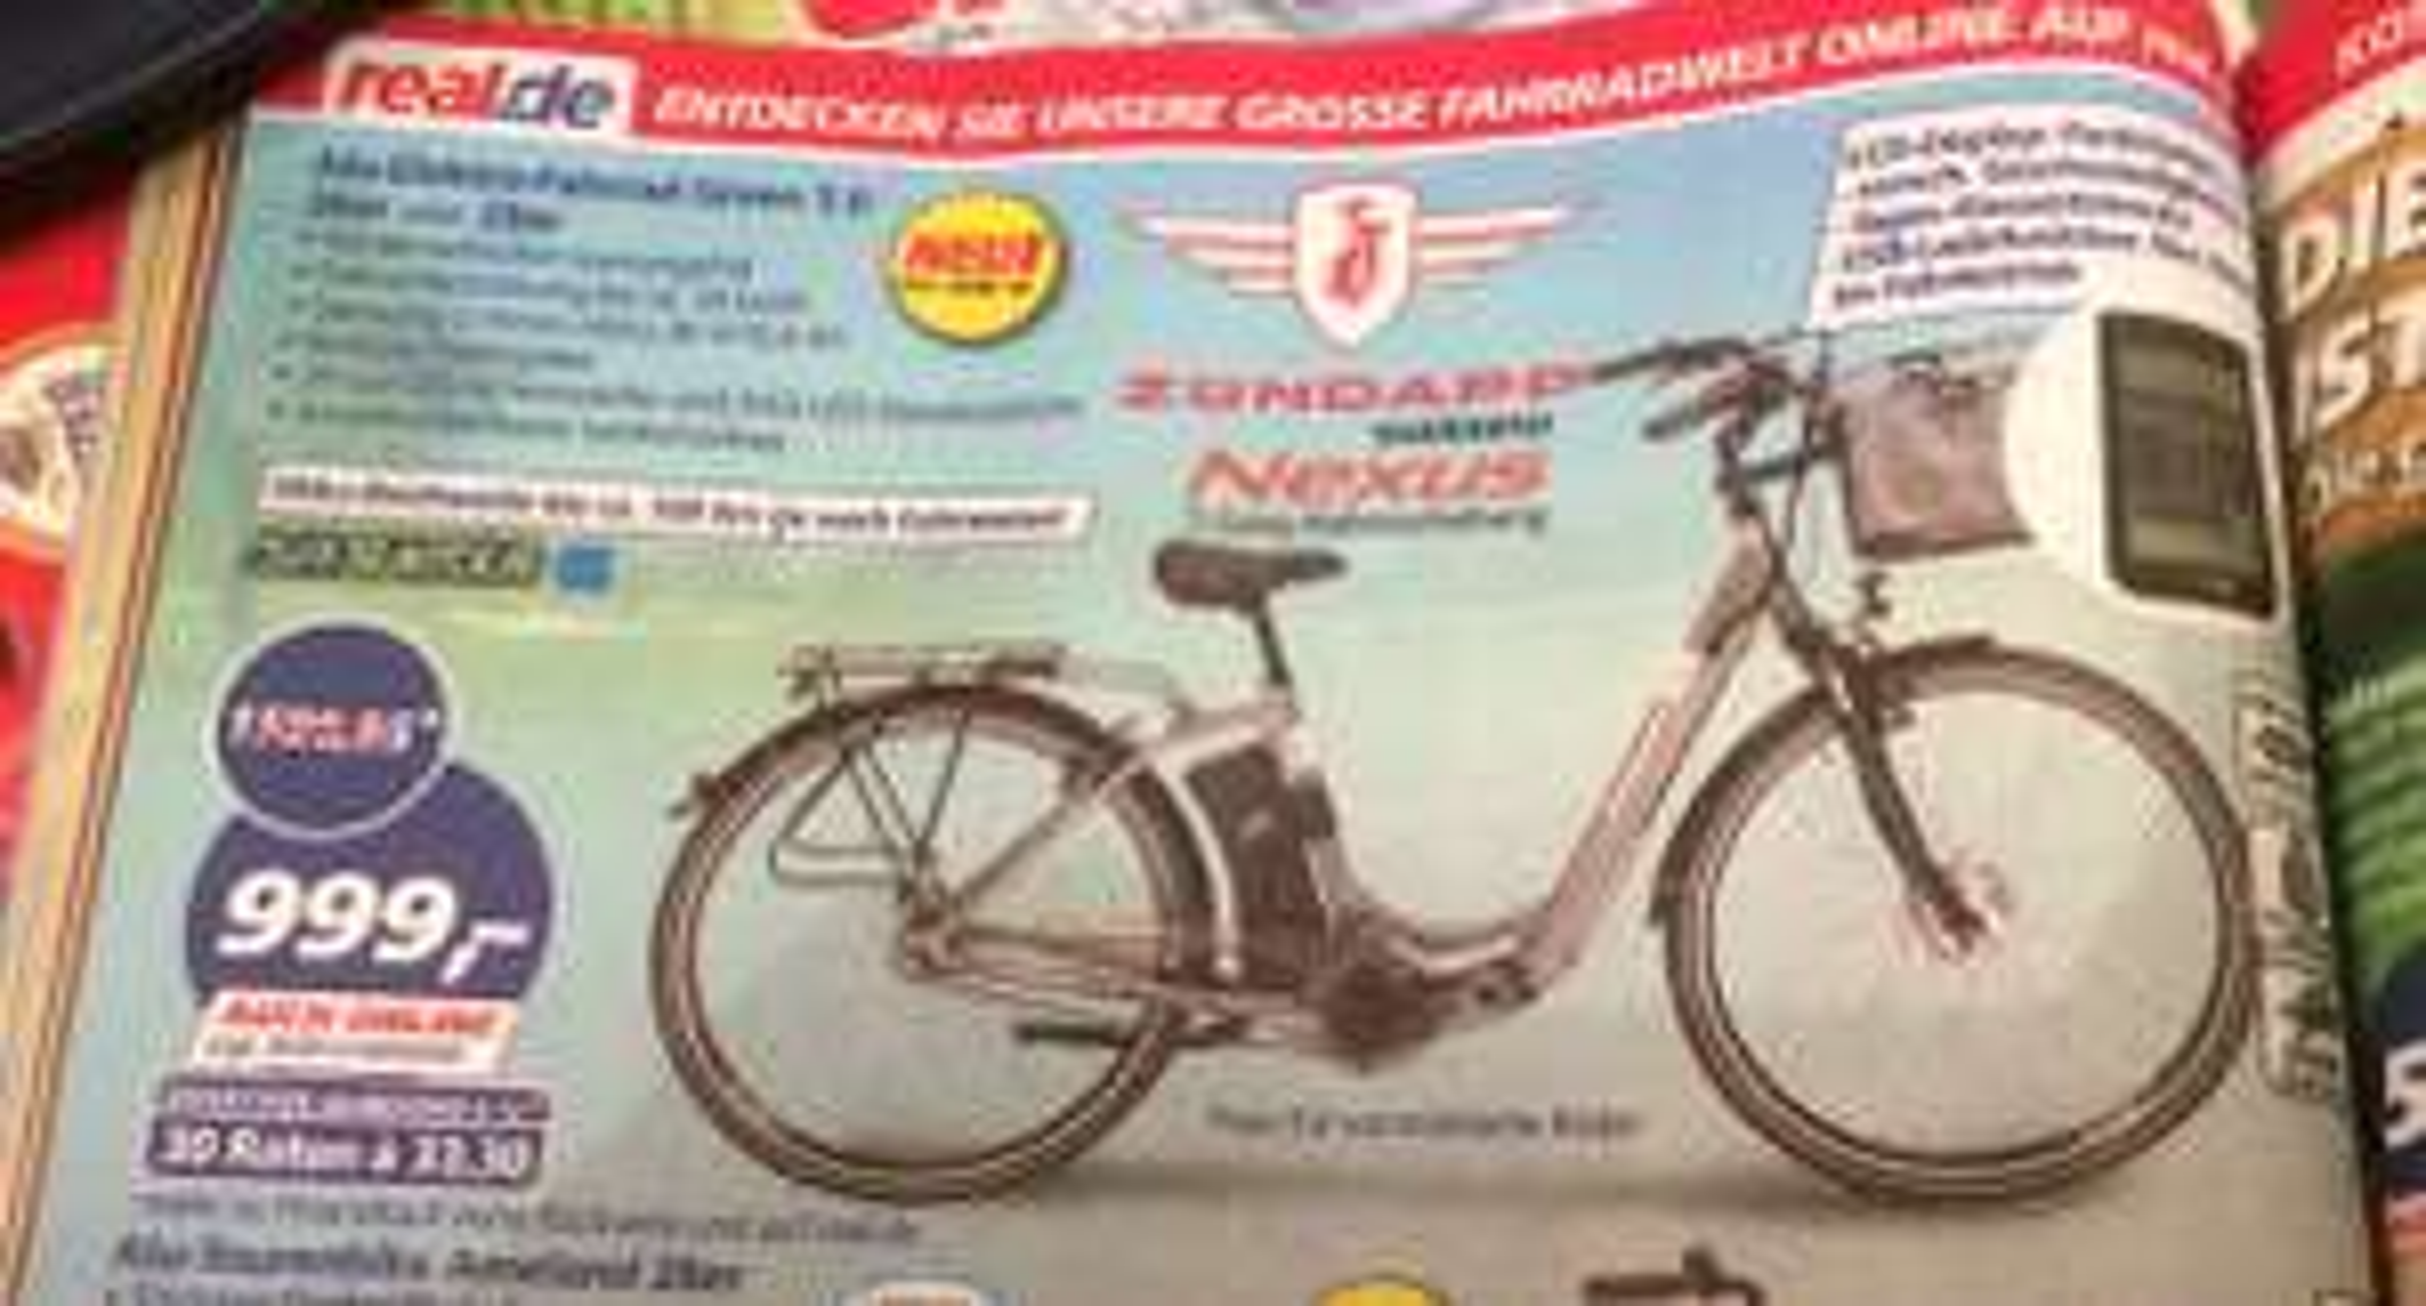 Günstige e-Bikes dank 150€ Rabatt bei [real]